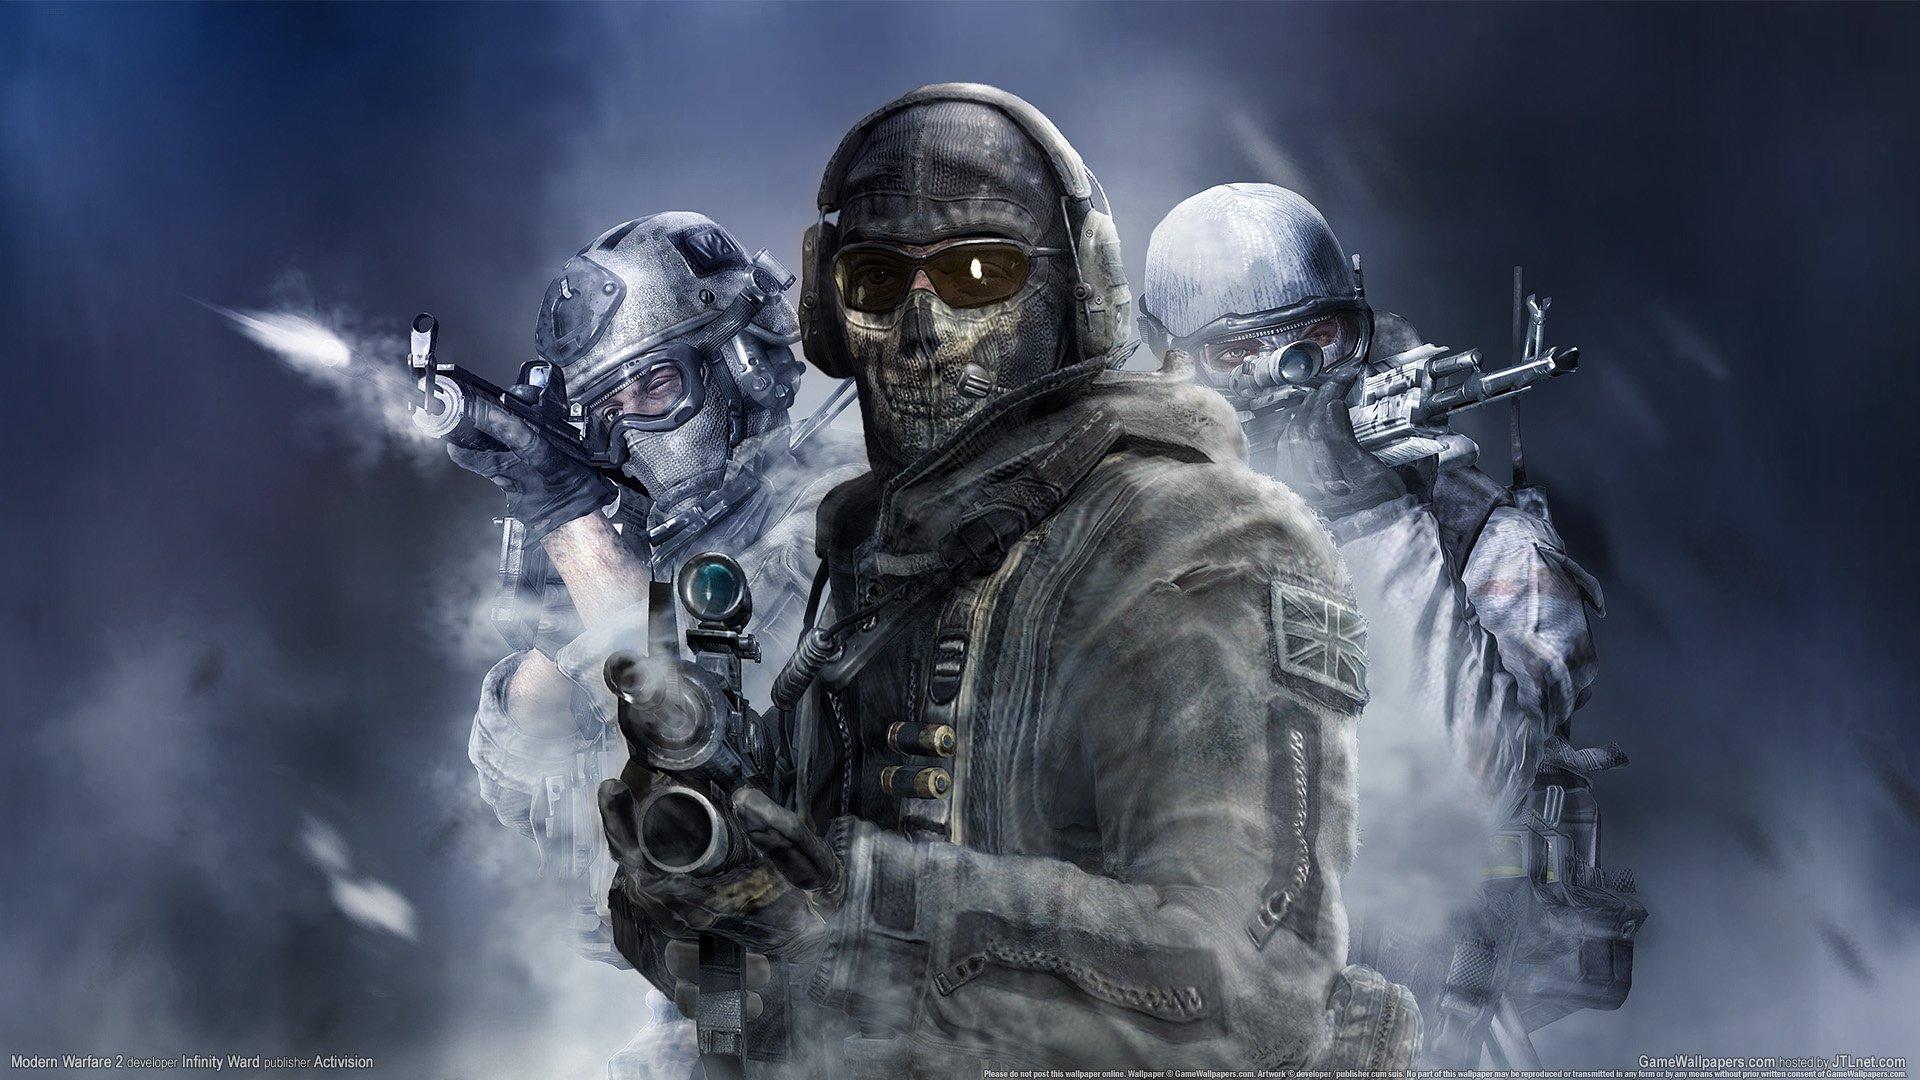 57 Call Of Duty Modern Warfare 2 Hd Wallpapers Background